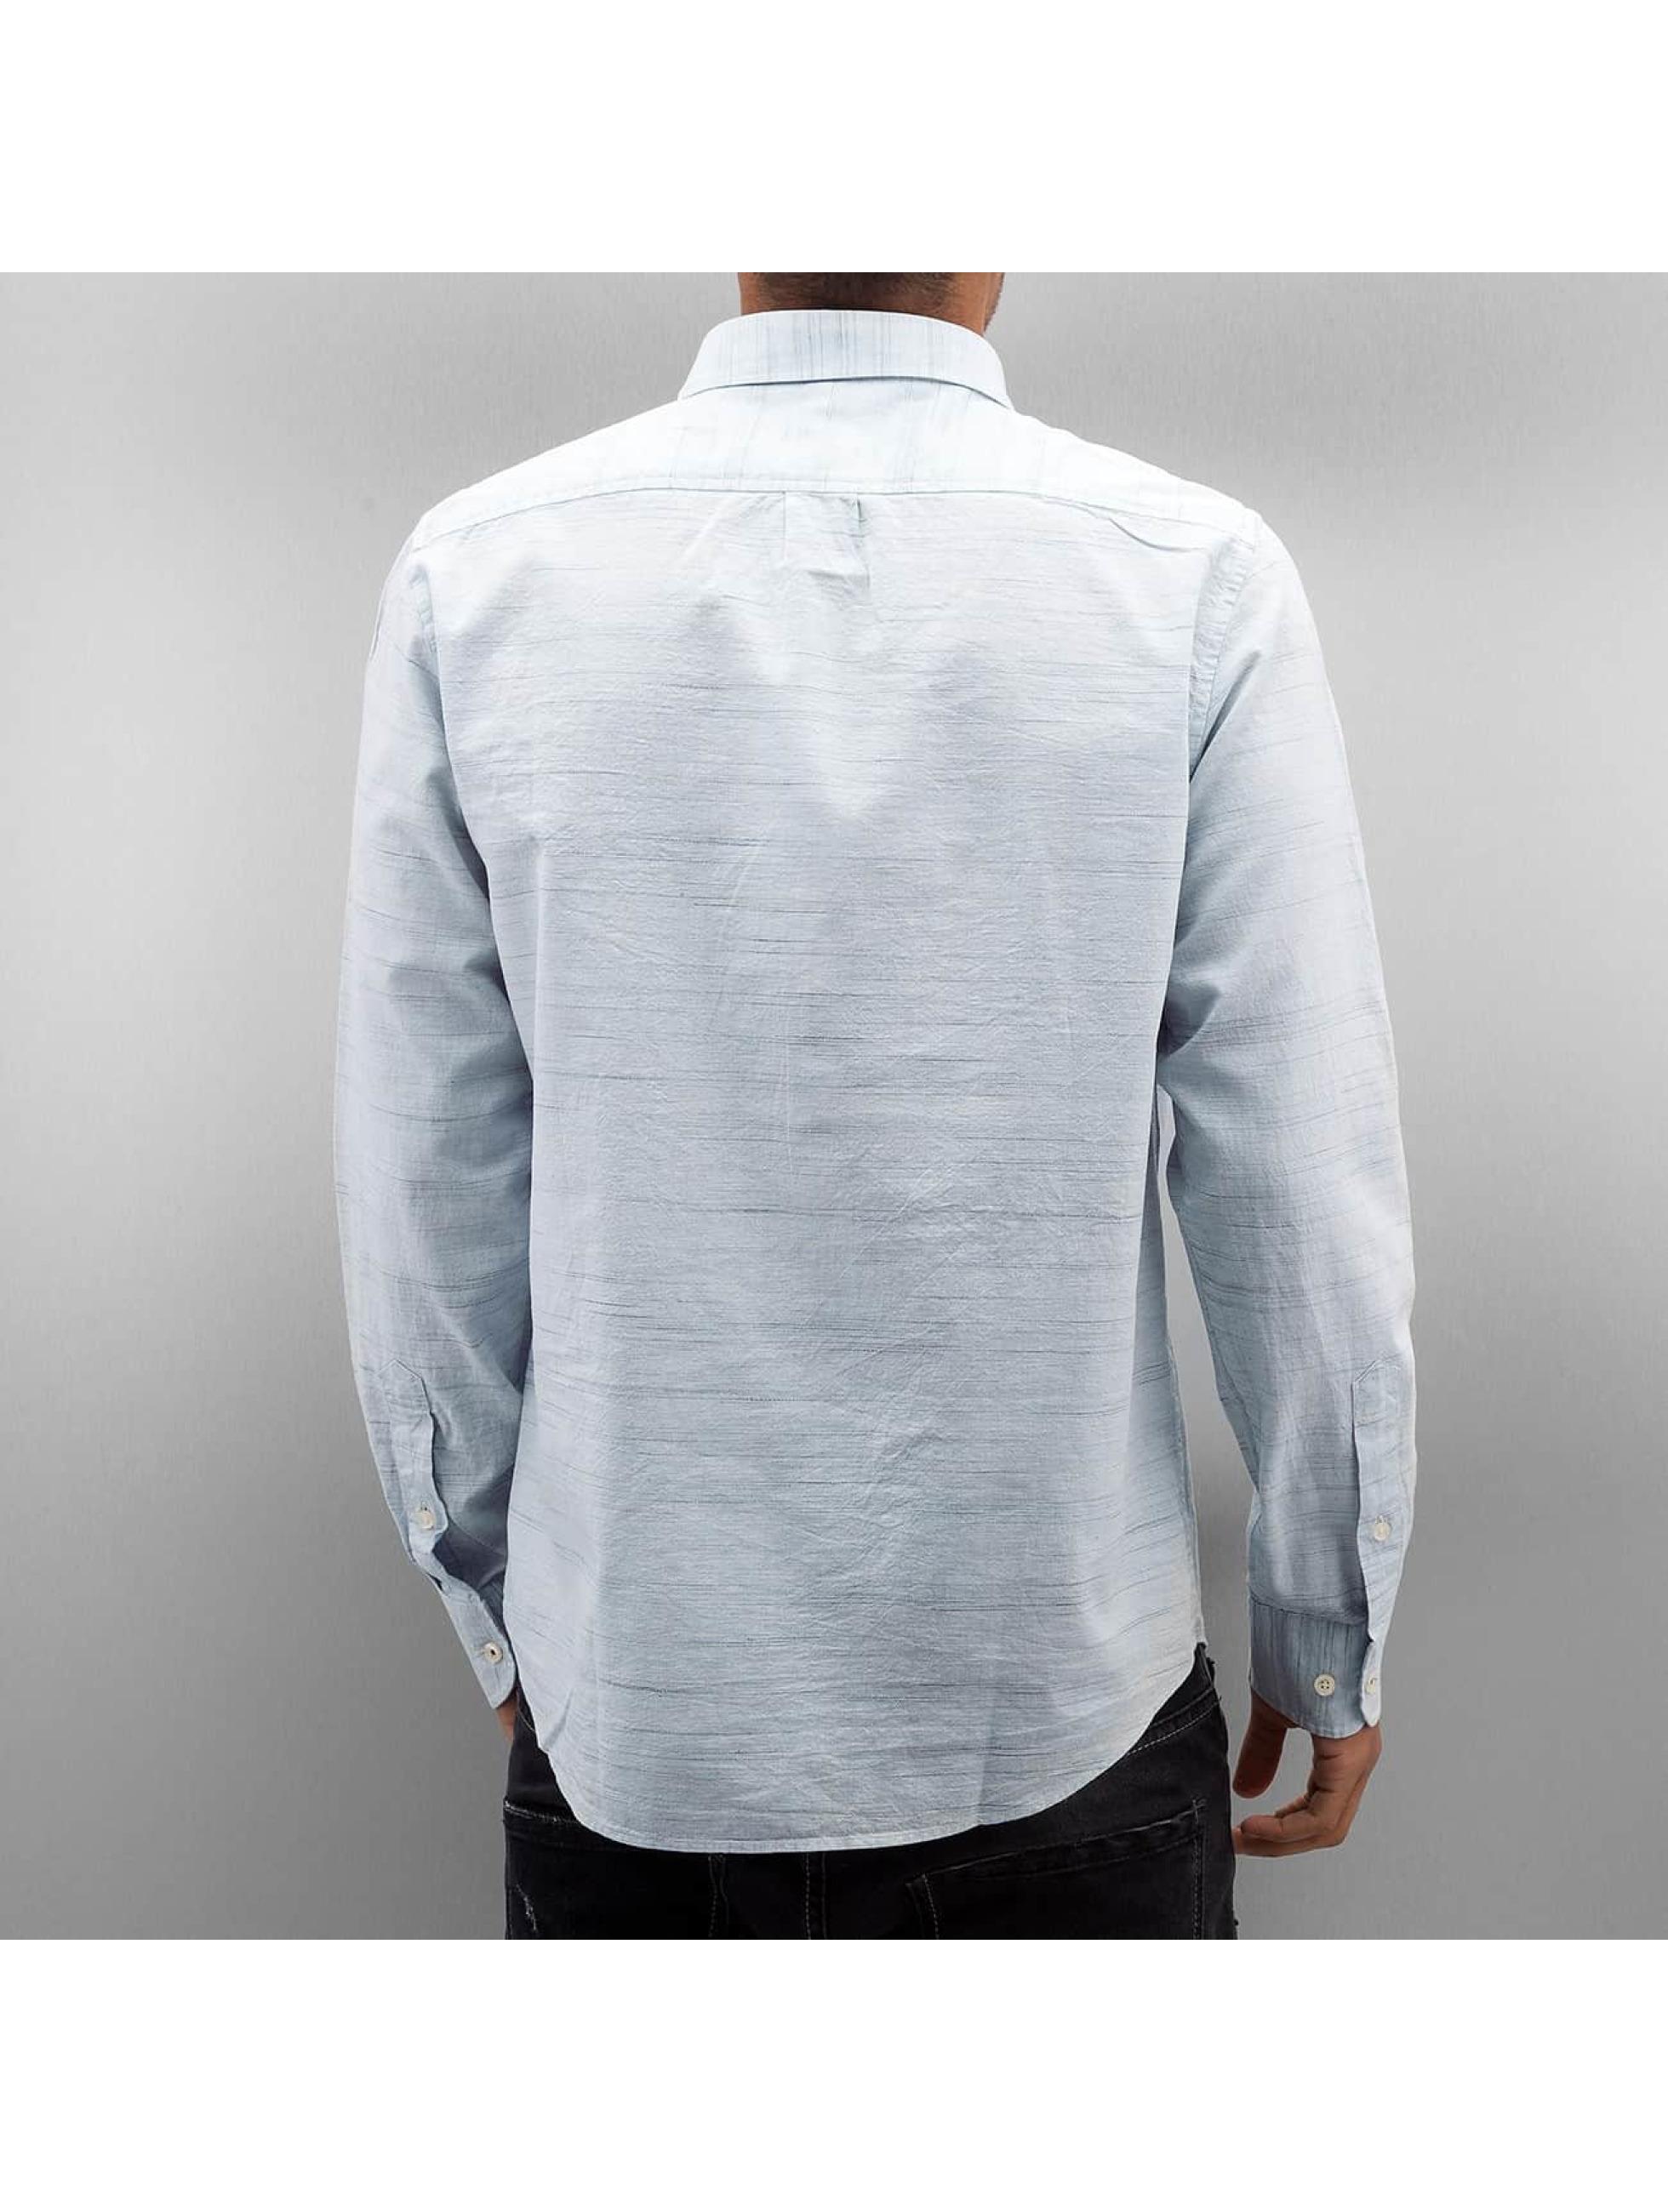 Lee Košele Button Down modrá